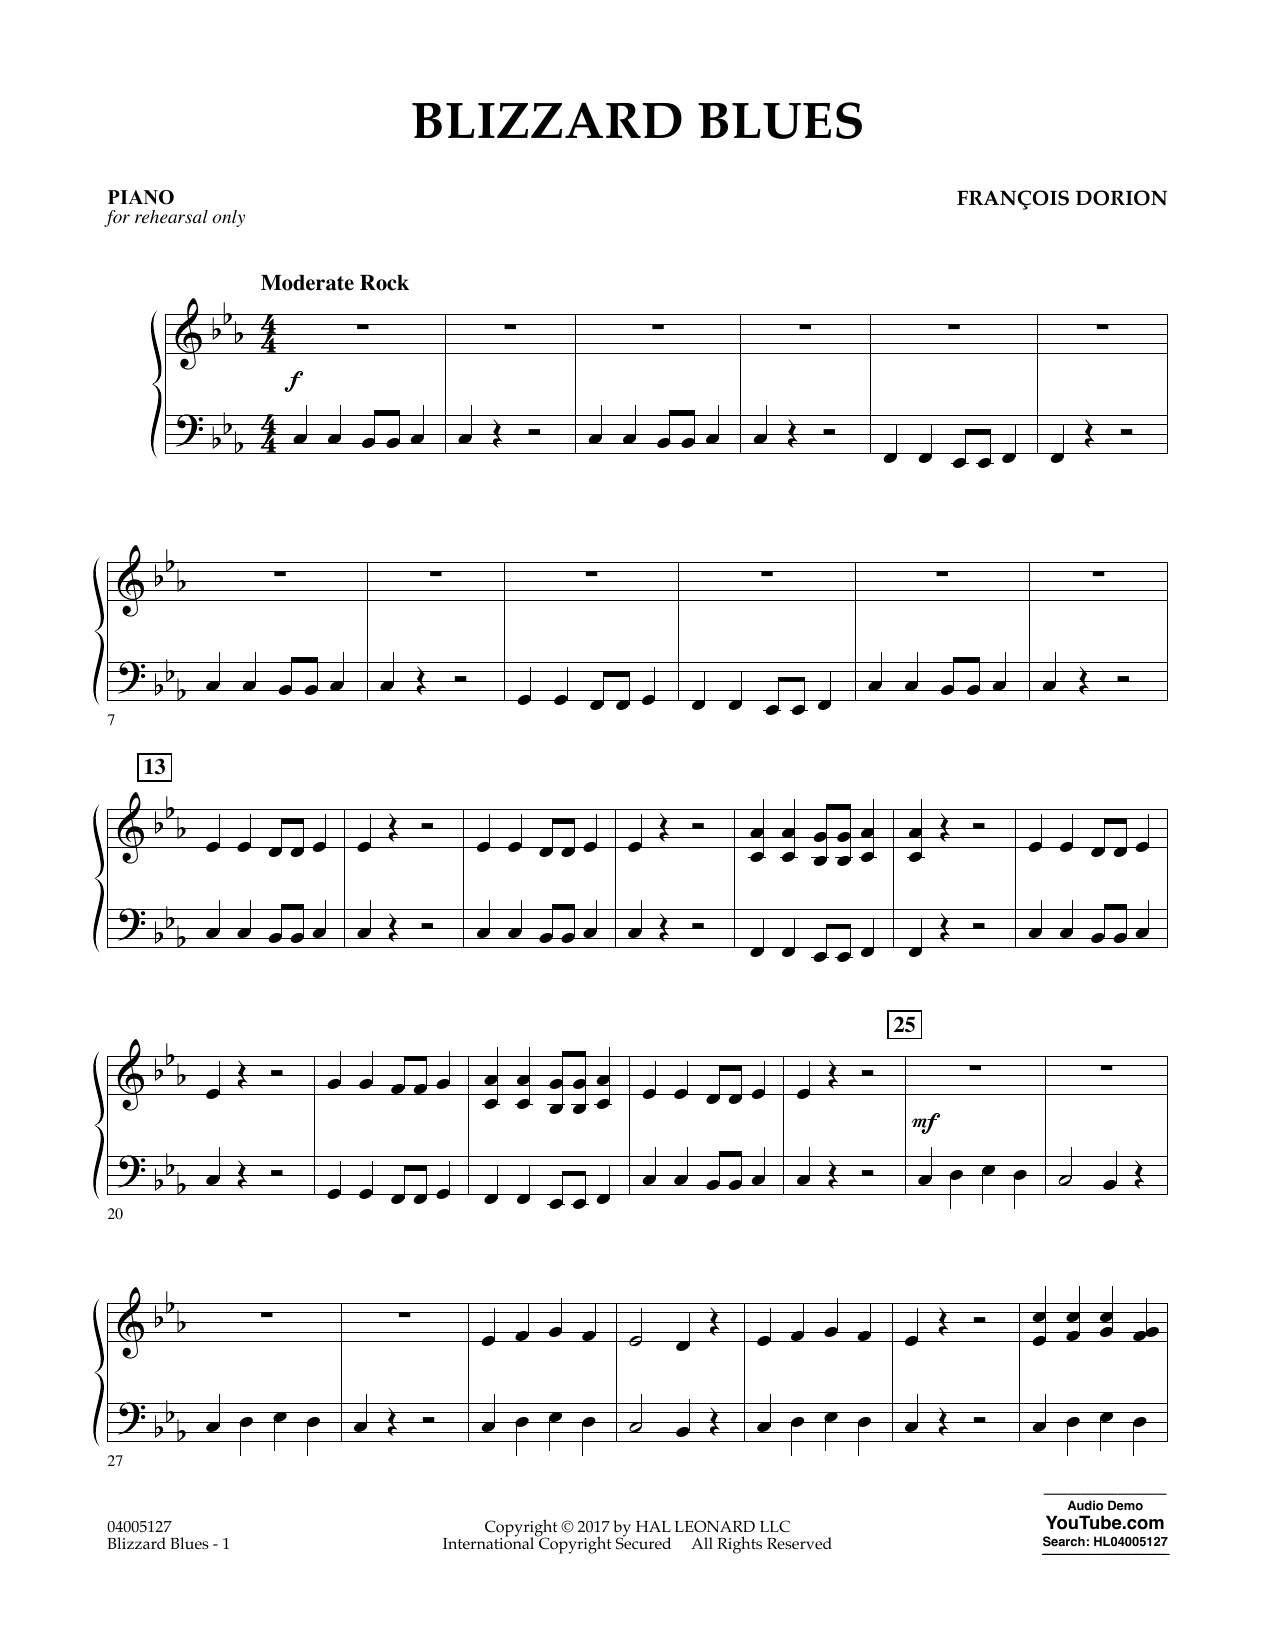 Blizzard Blues - Piano Sheet Music